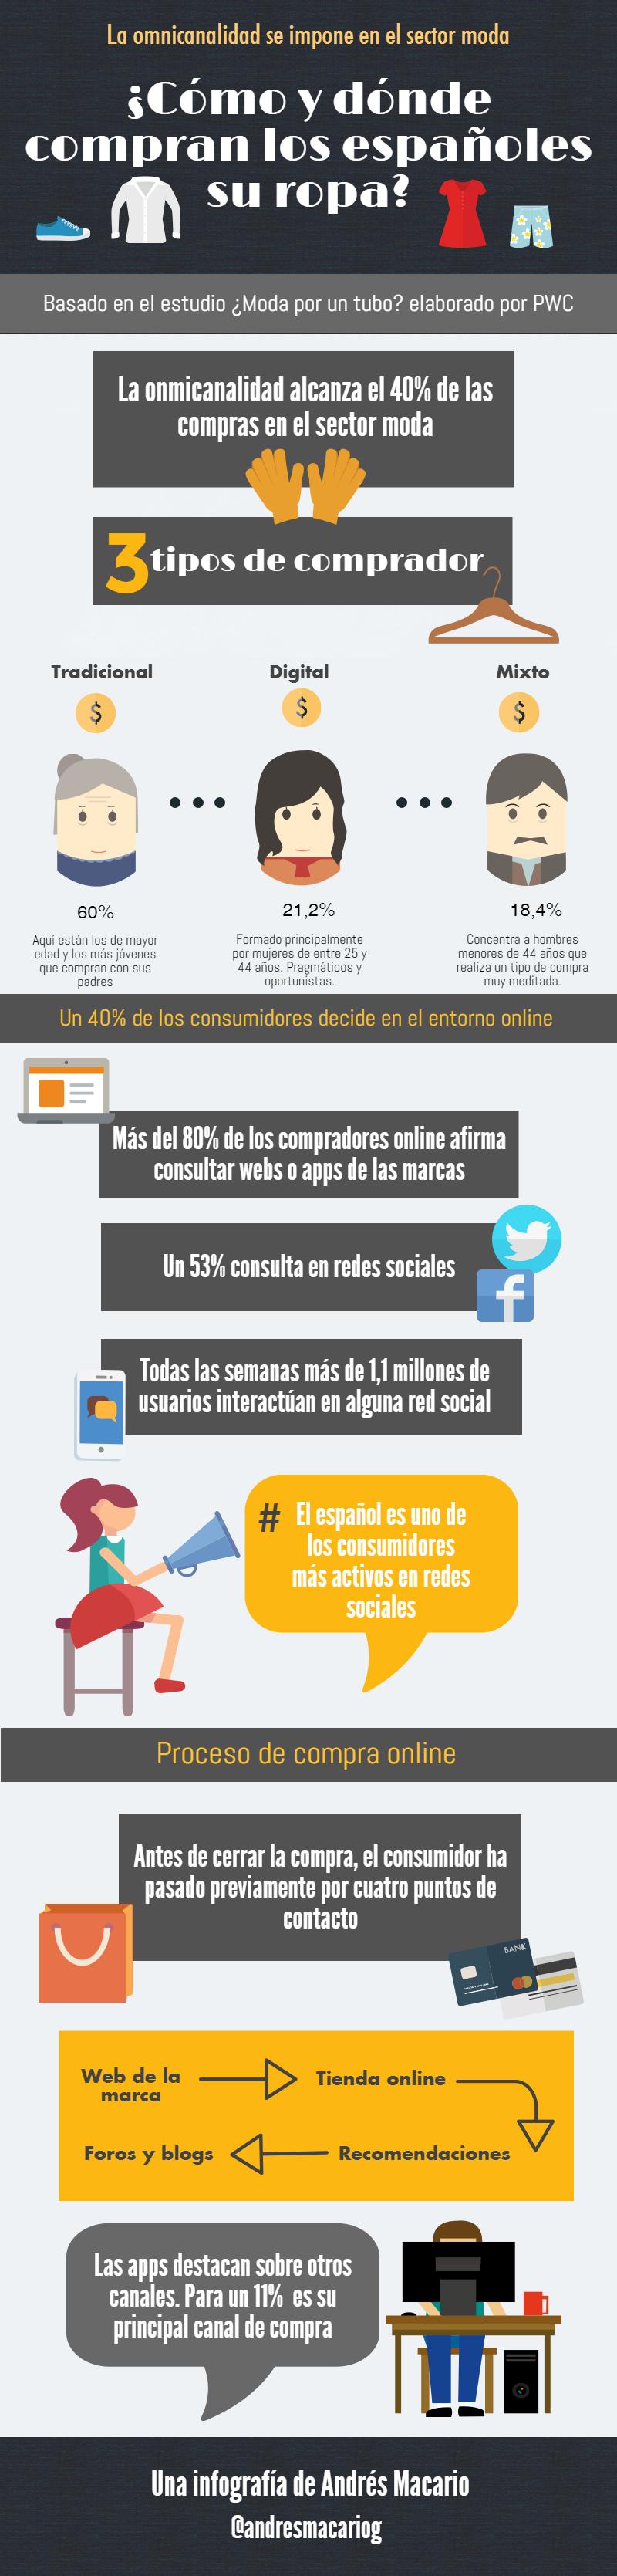 Omnicanalidad sector moda - Infografia Andres Macario